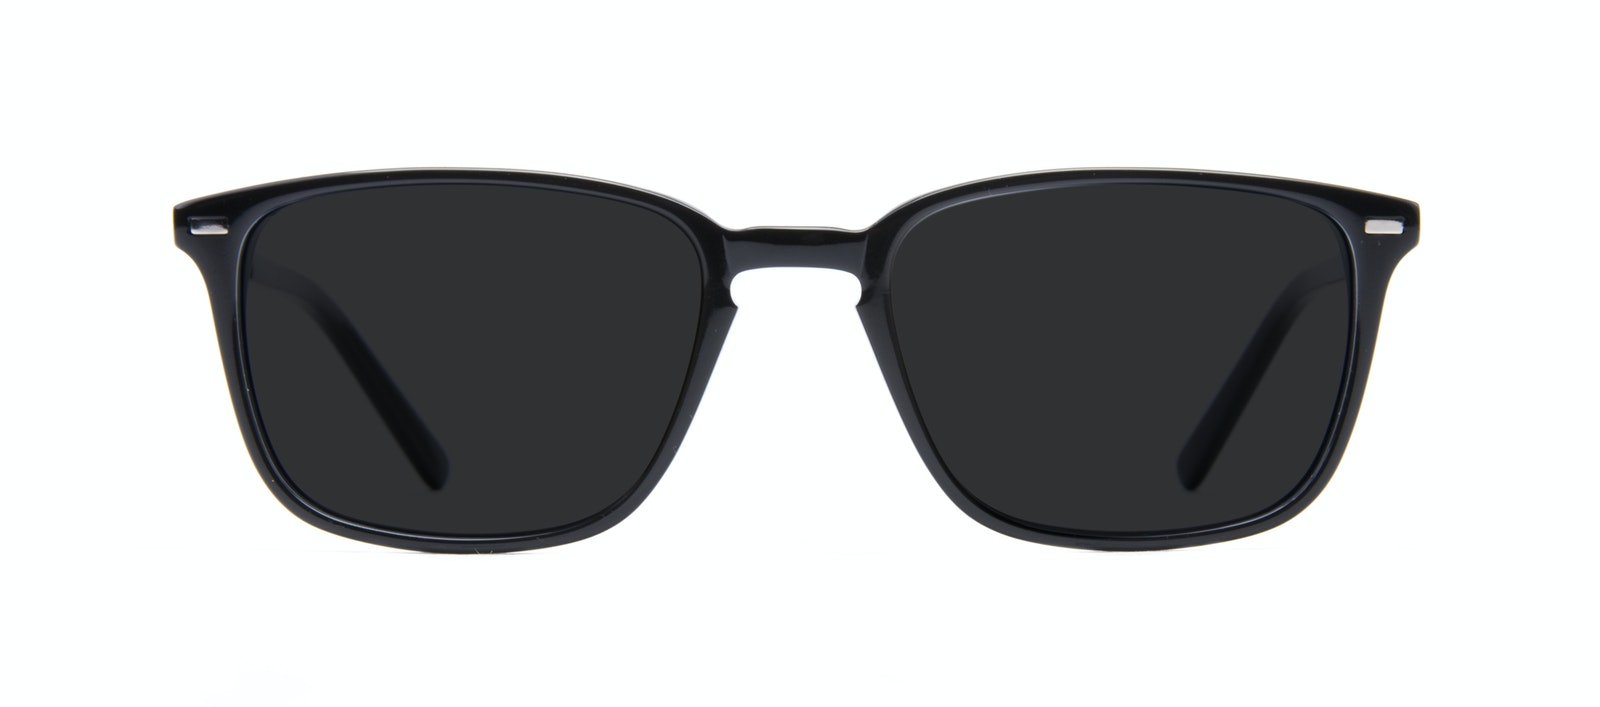 Affordable Fashion Glasses Rectangle Sunglasses Men Sharp Black Front